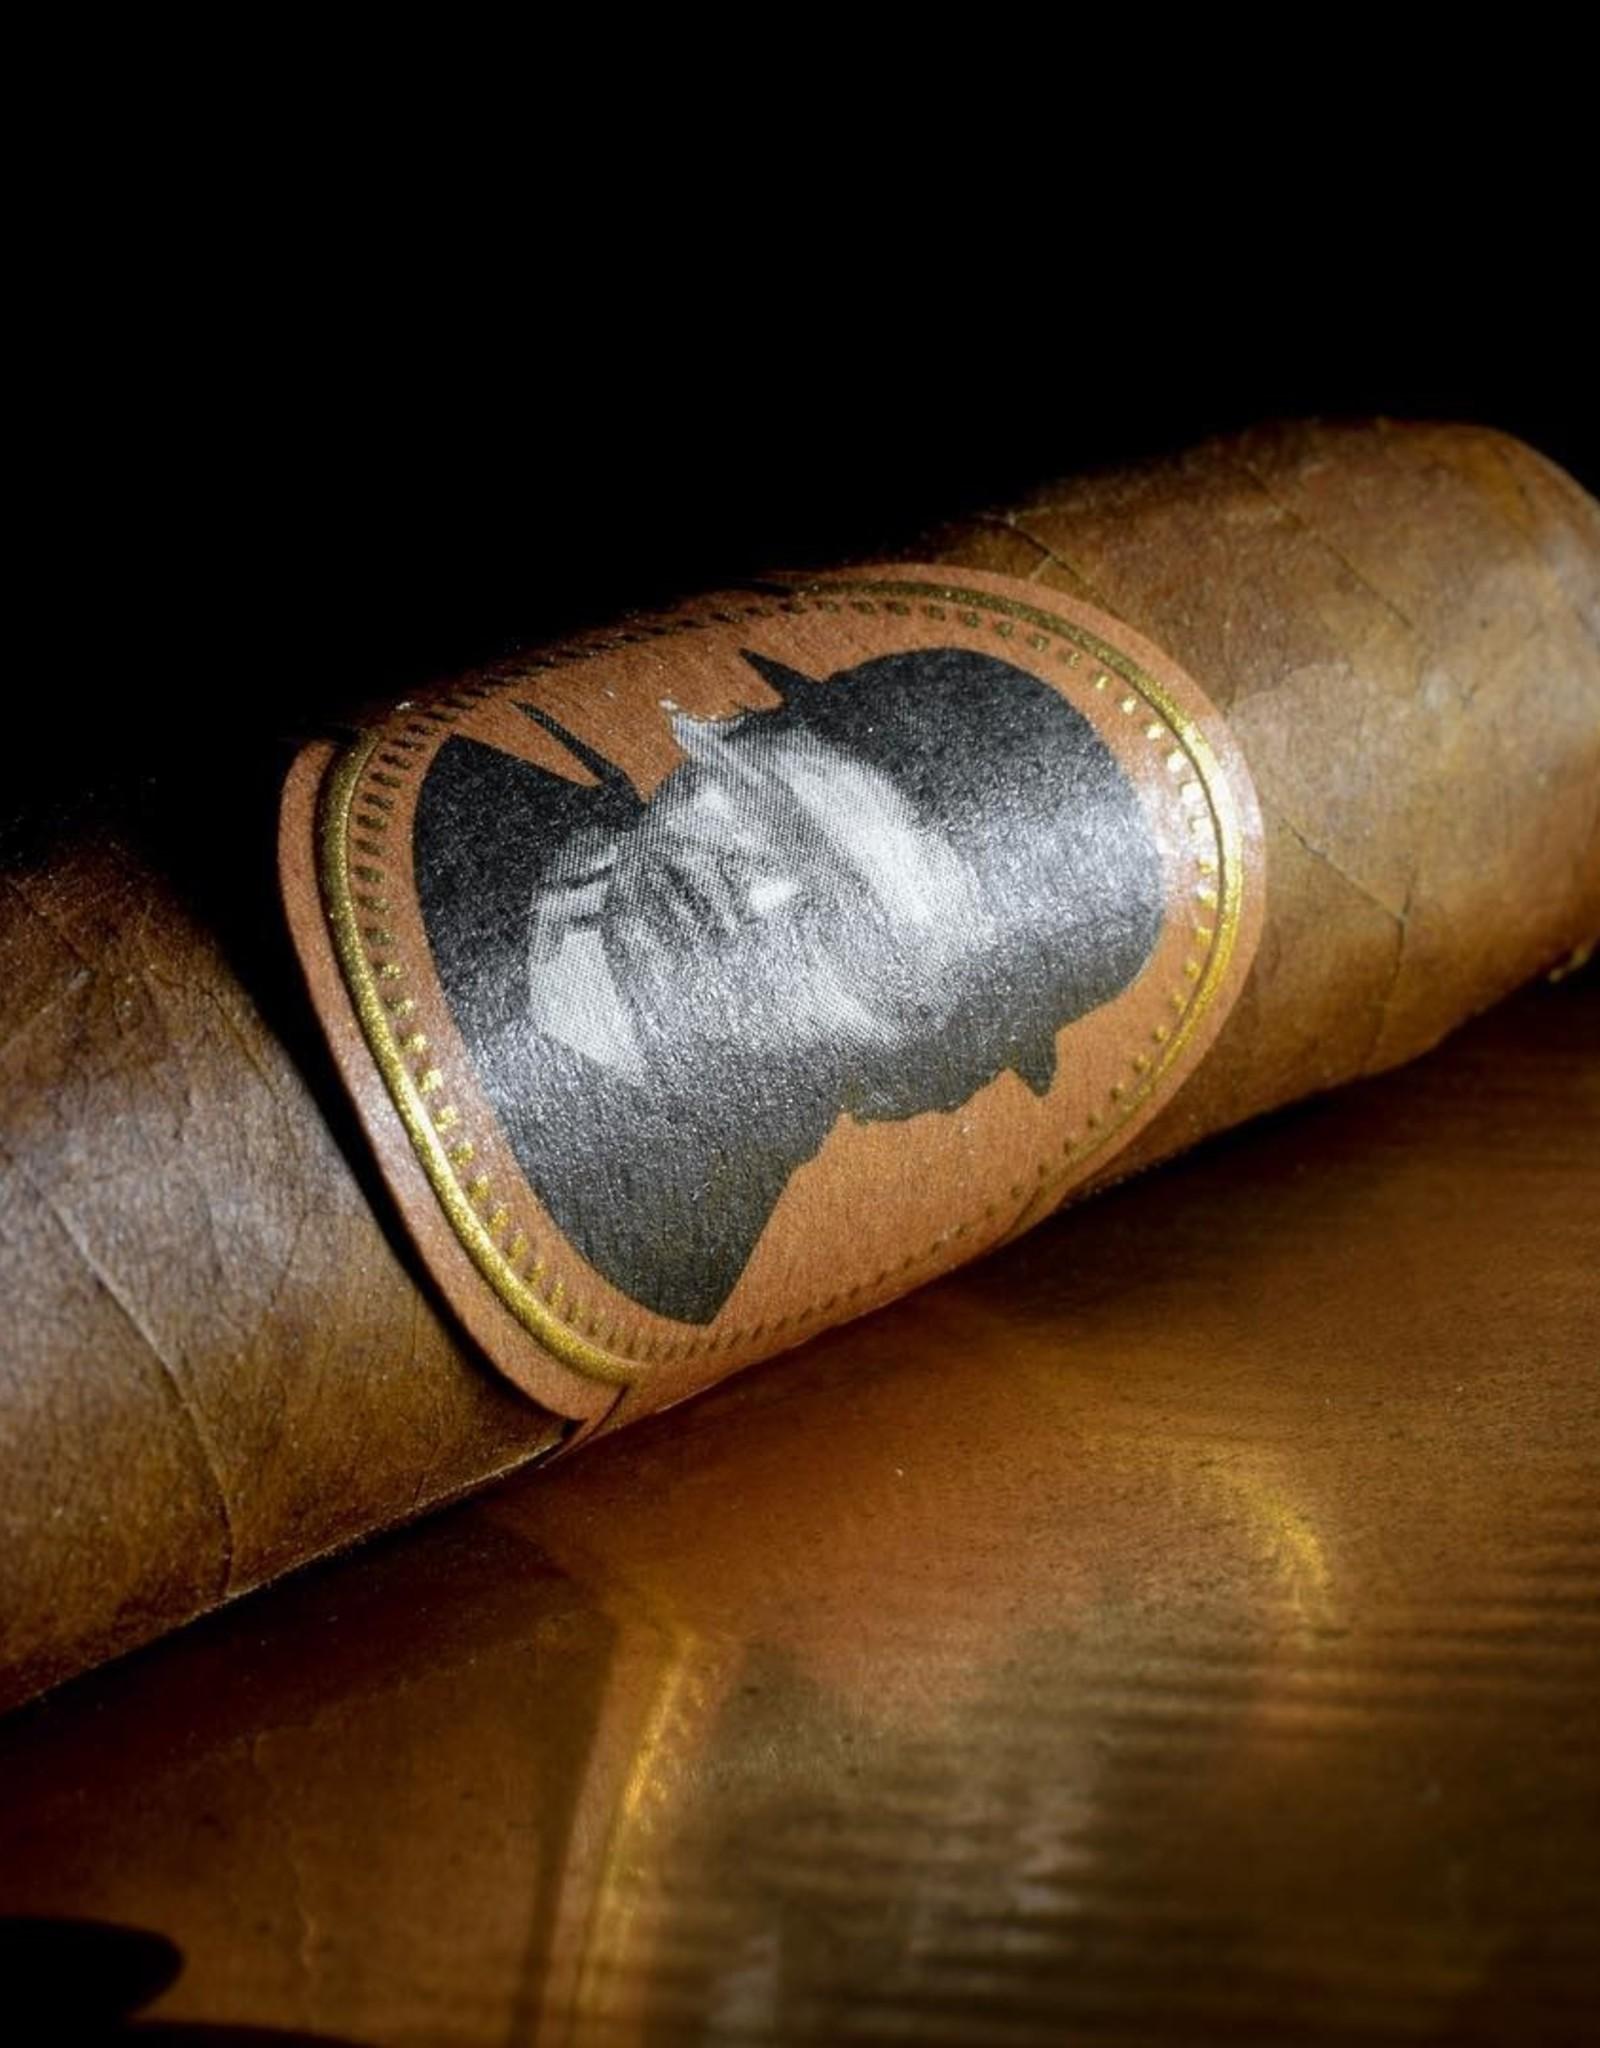 Caldwell Cigar Co Copy of Caldwell Eastern Standard Coretto Robusto 5 x 50 Single